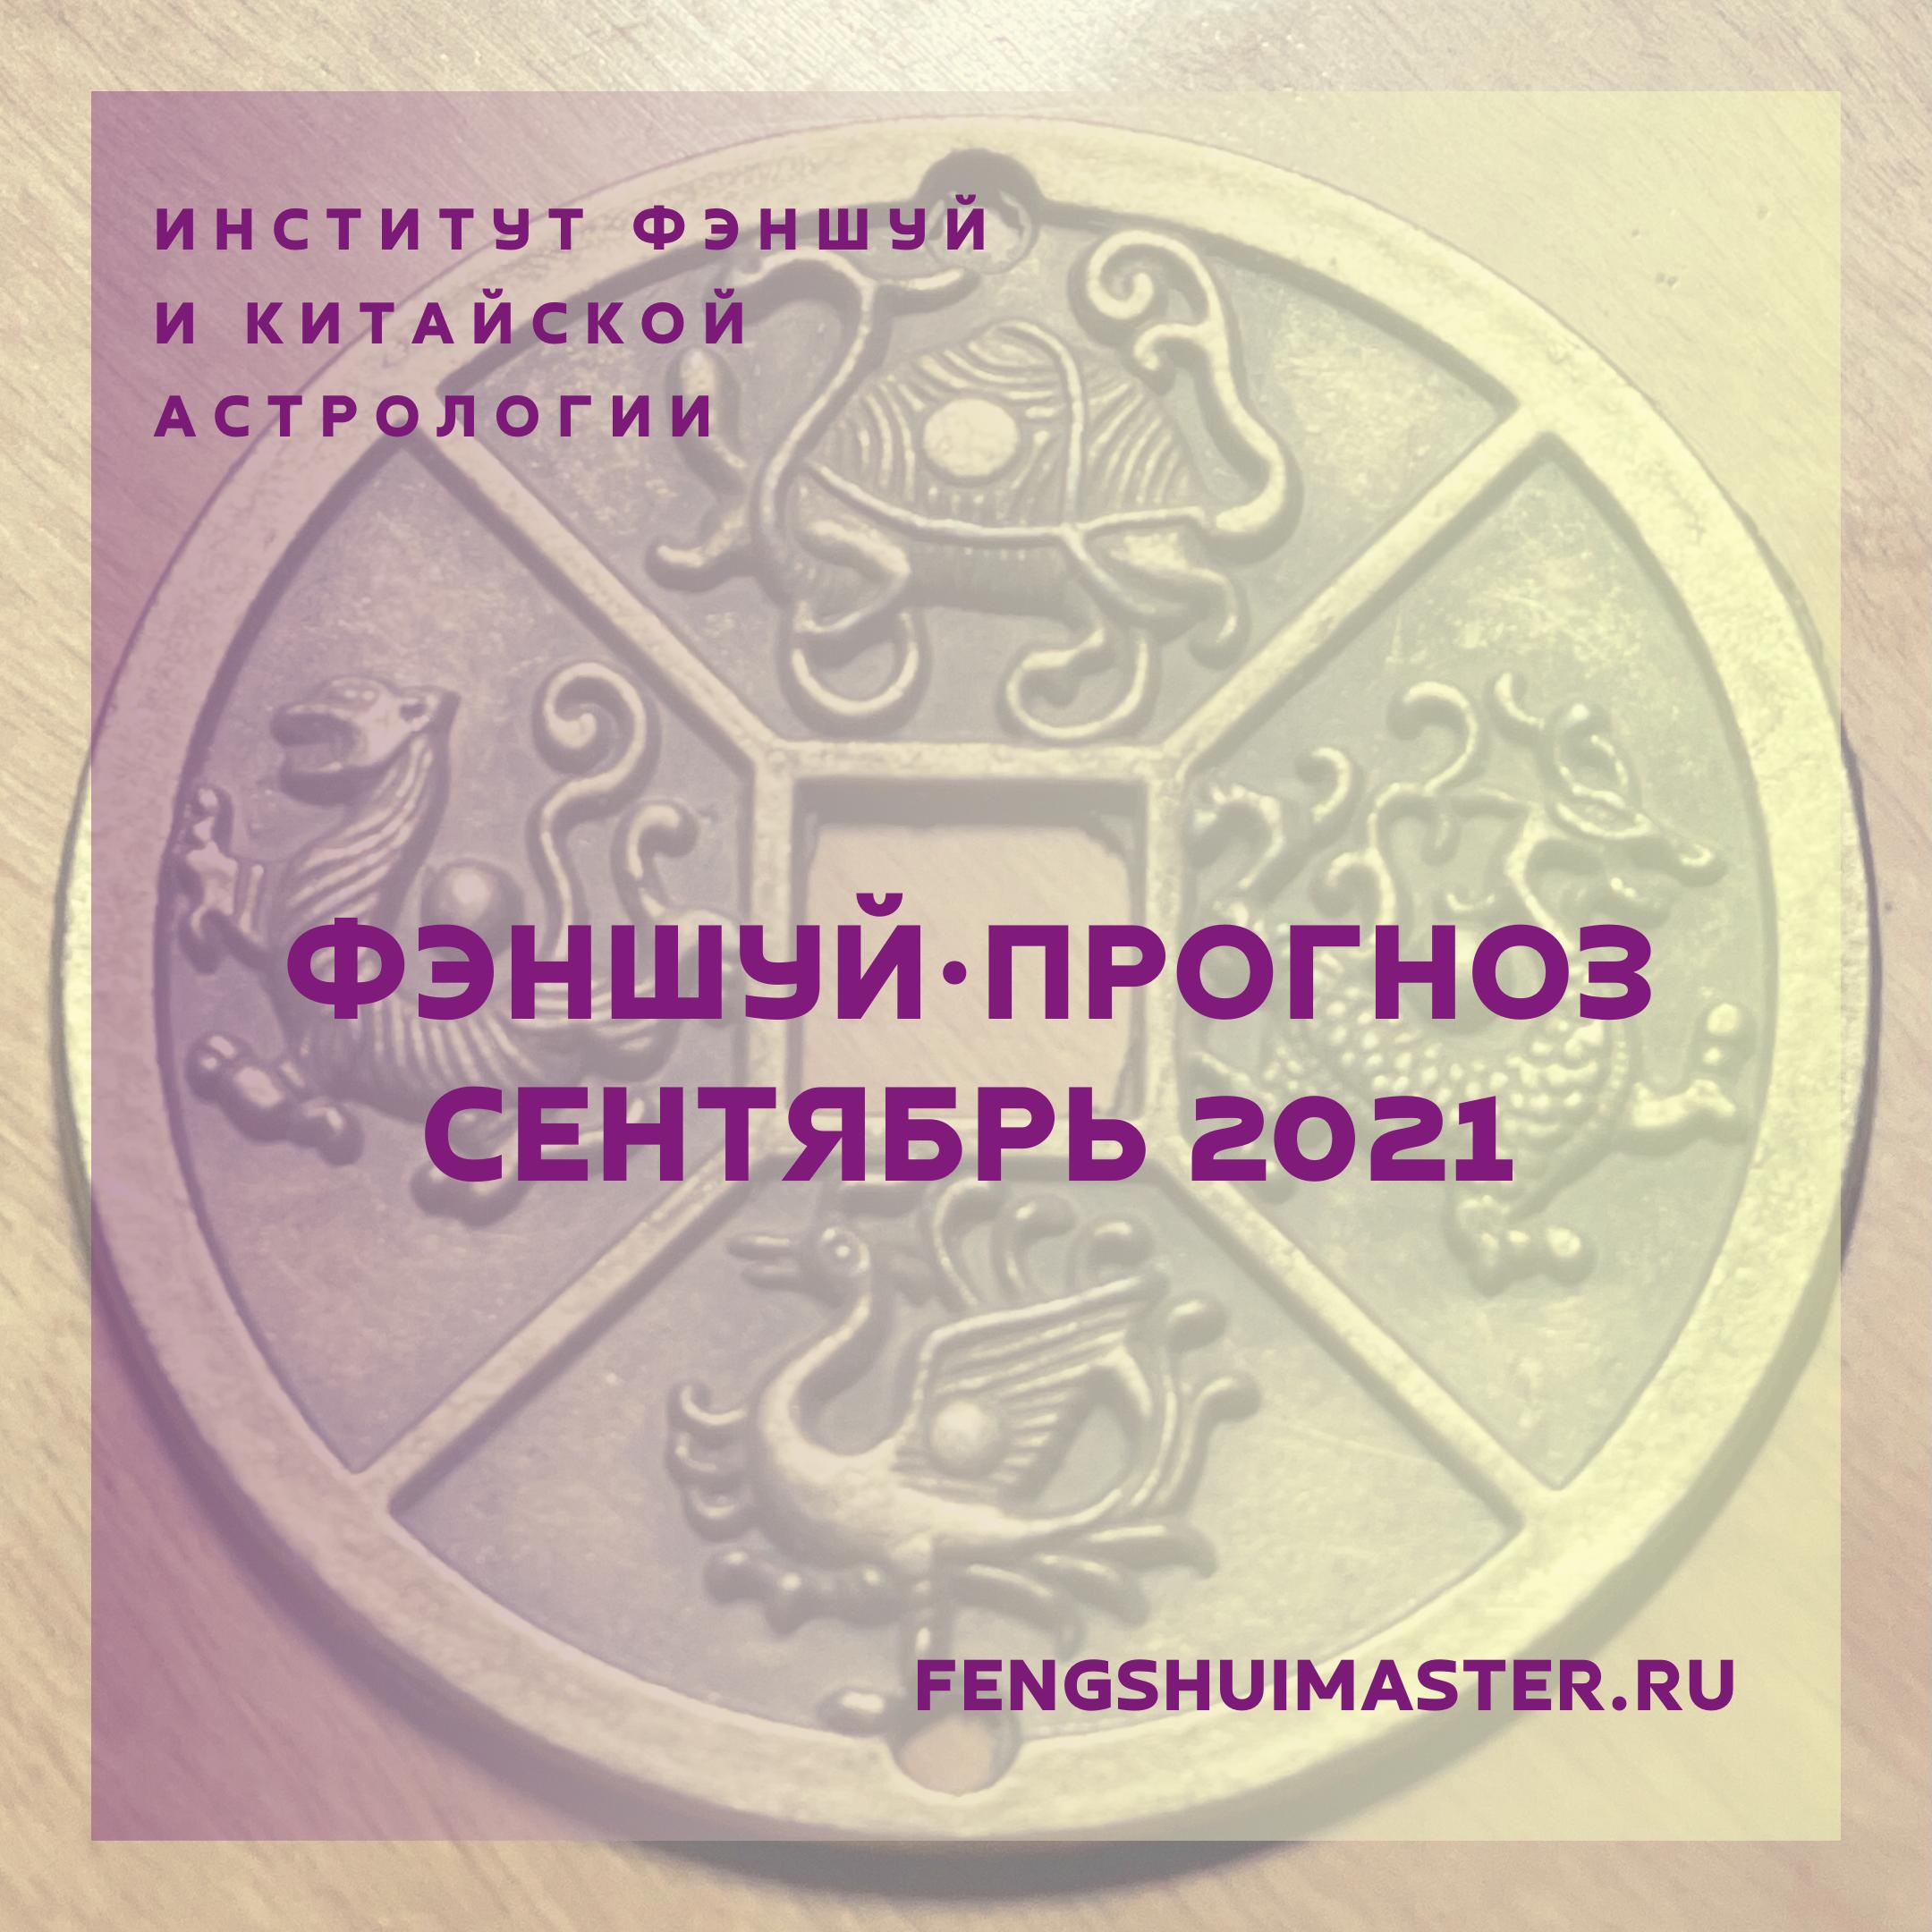 Фэншуй-прогноз на сентябрь 2021 - Fengshuimaster.Ru